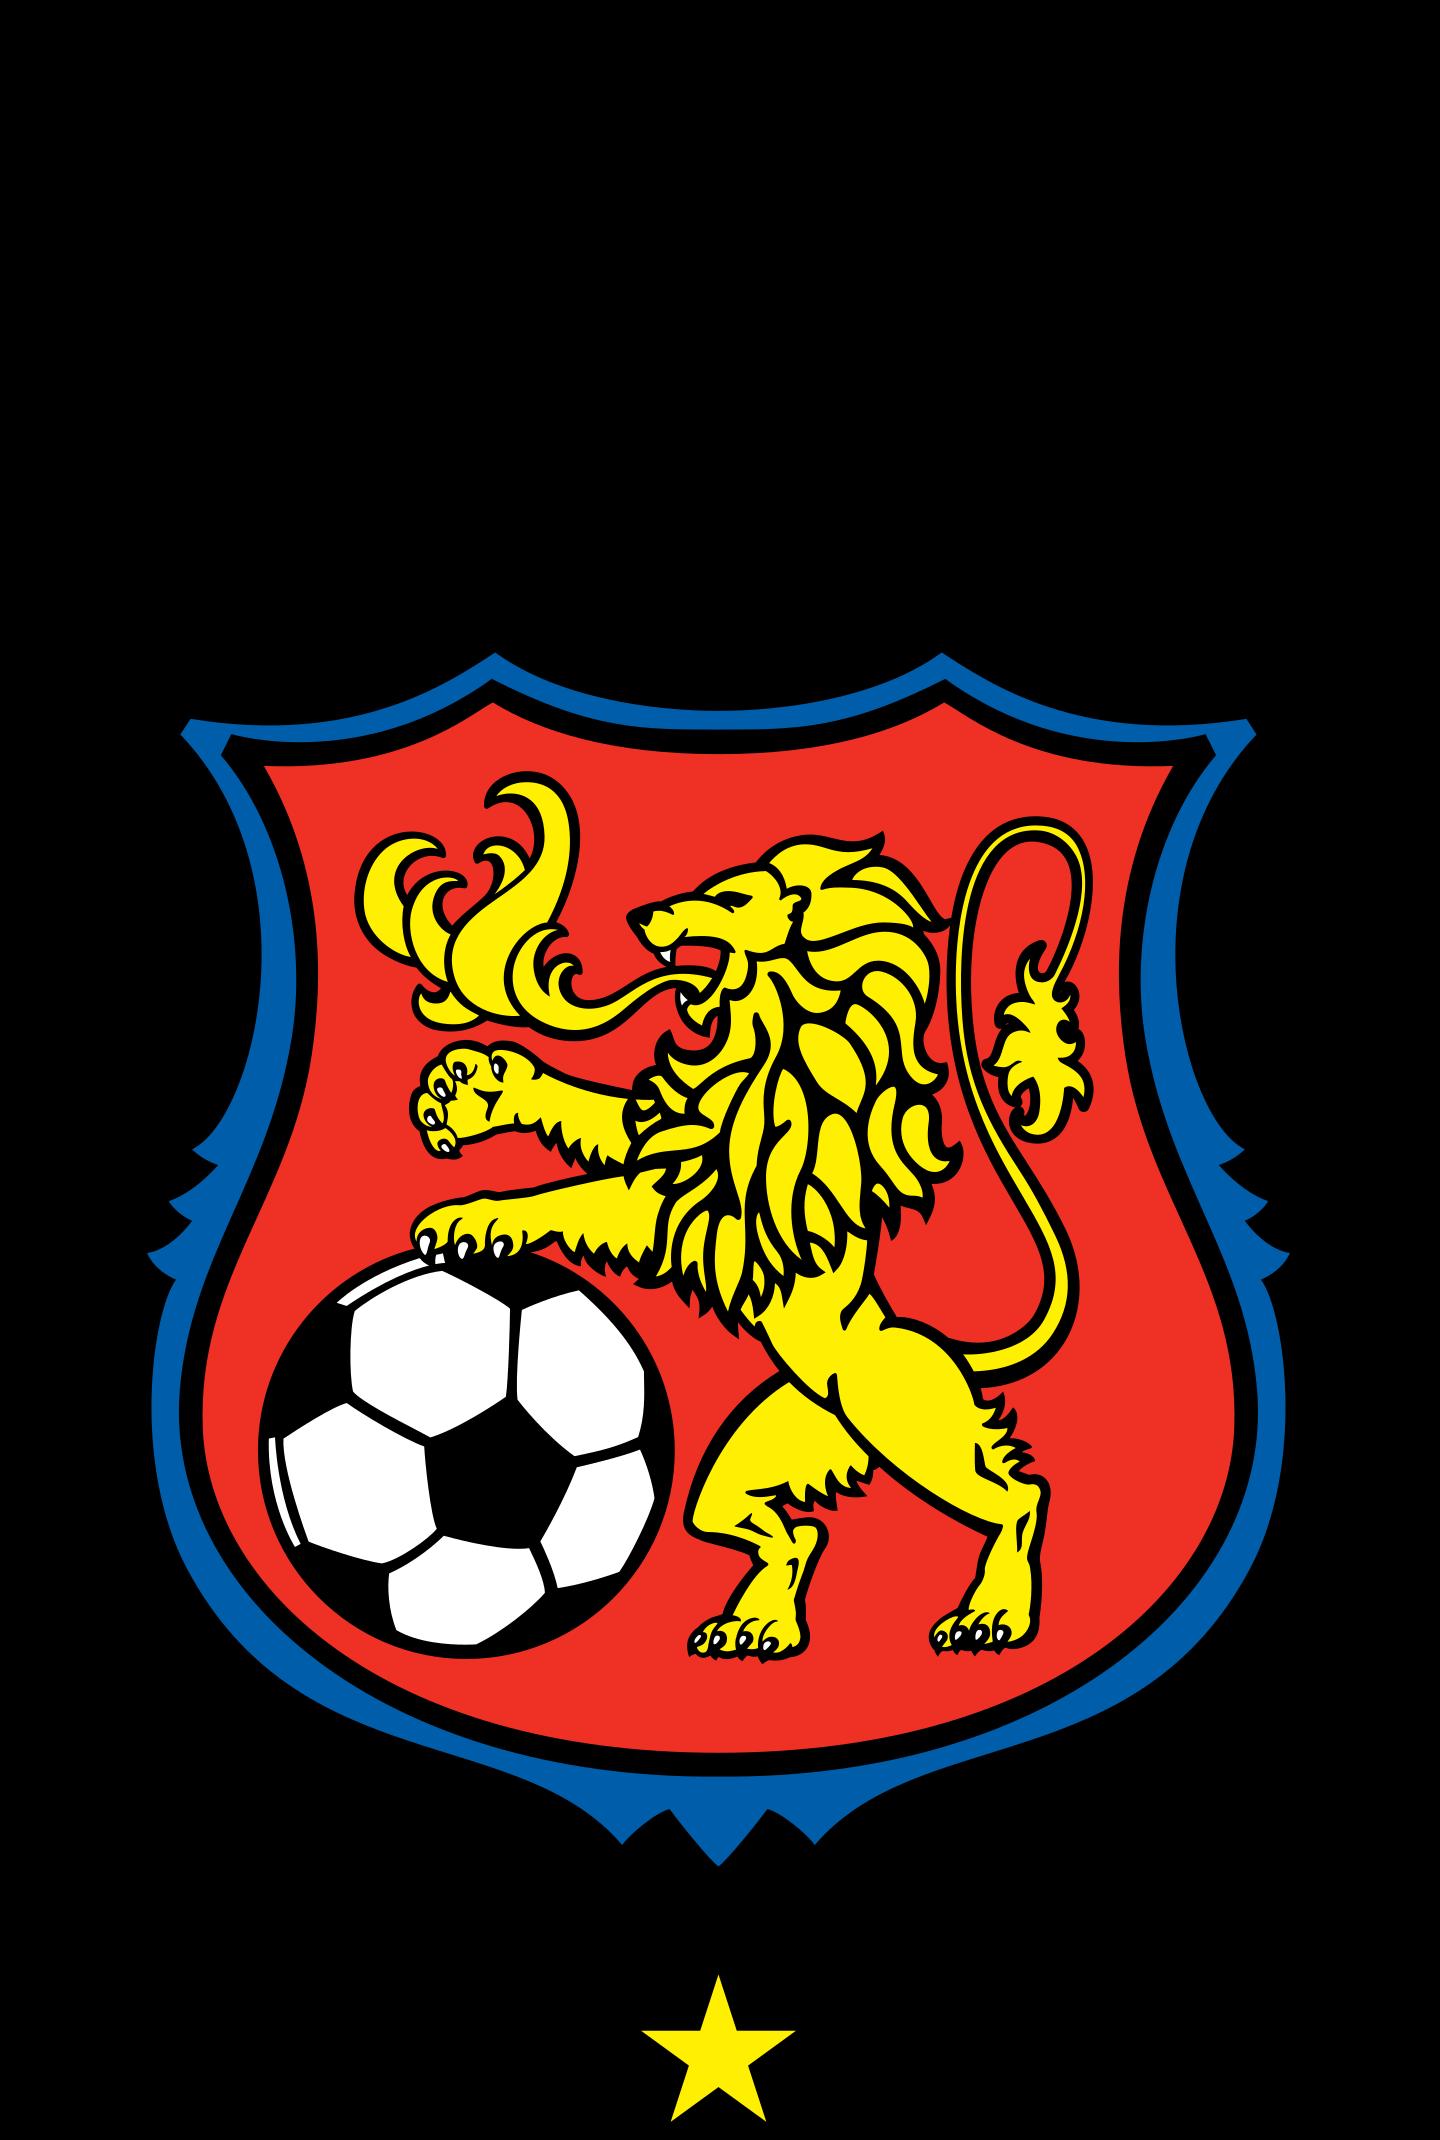 caracas fc logo 2 - Caracas FC Logo